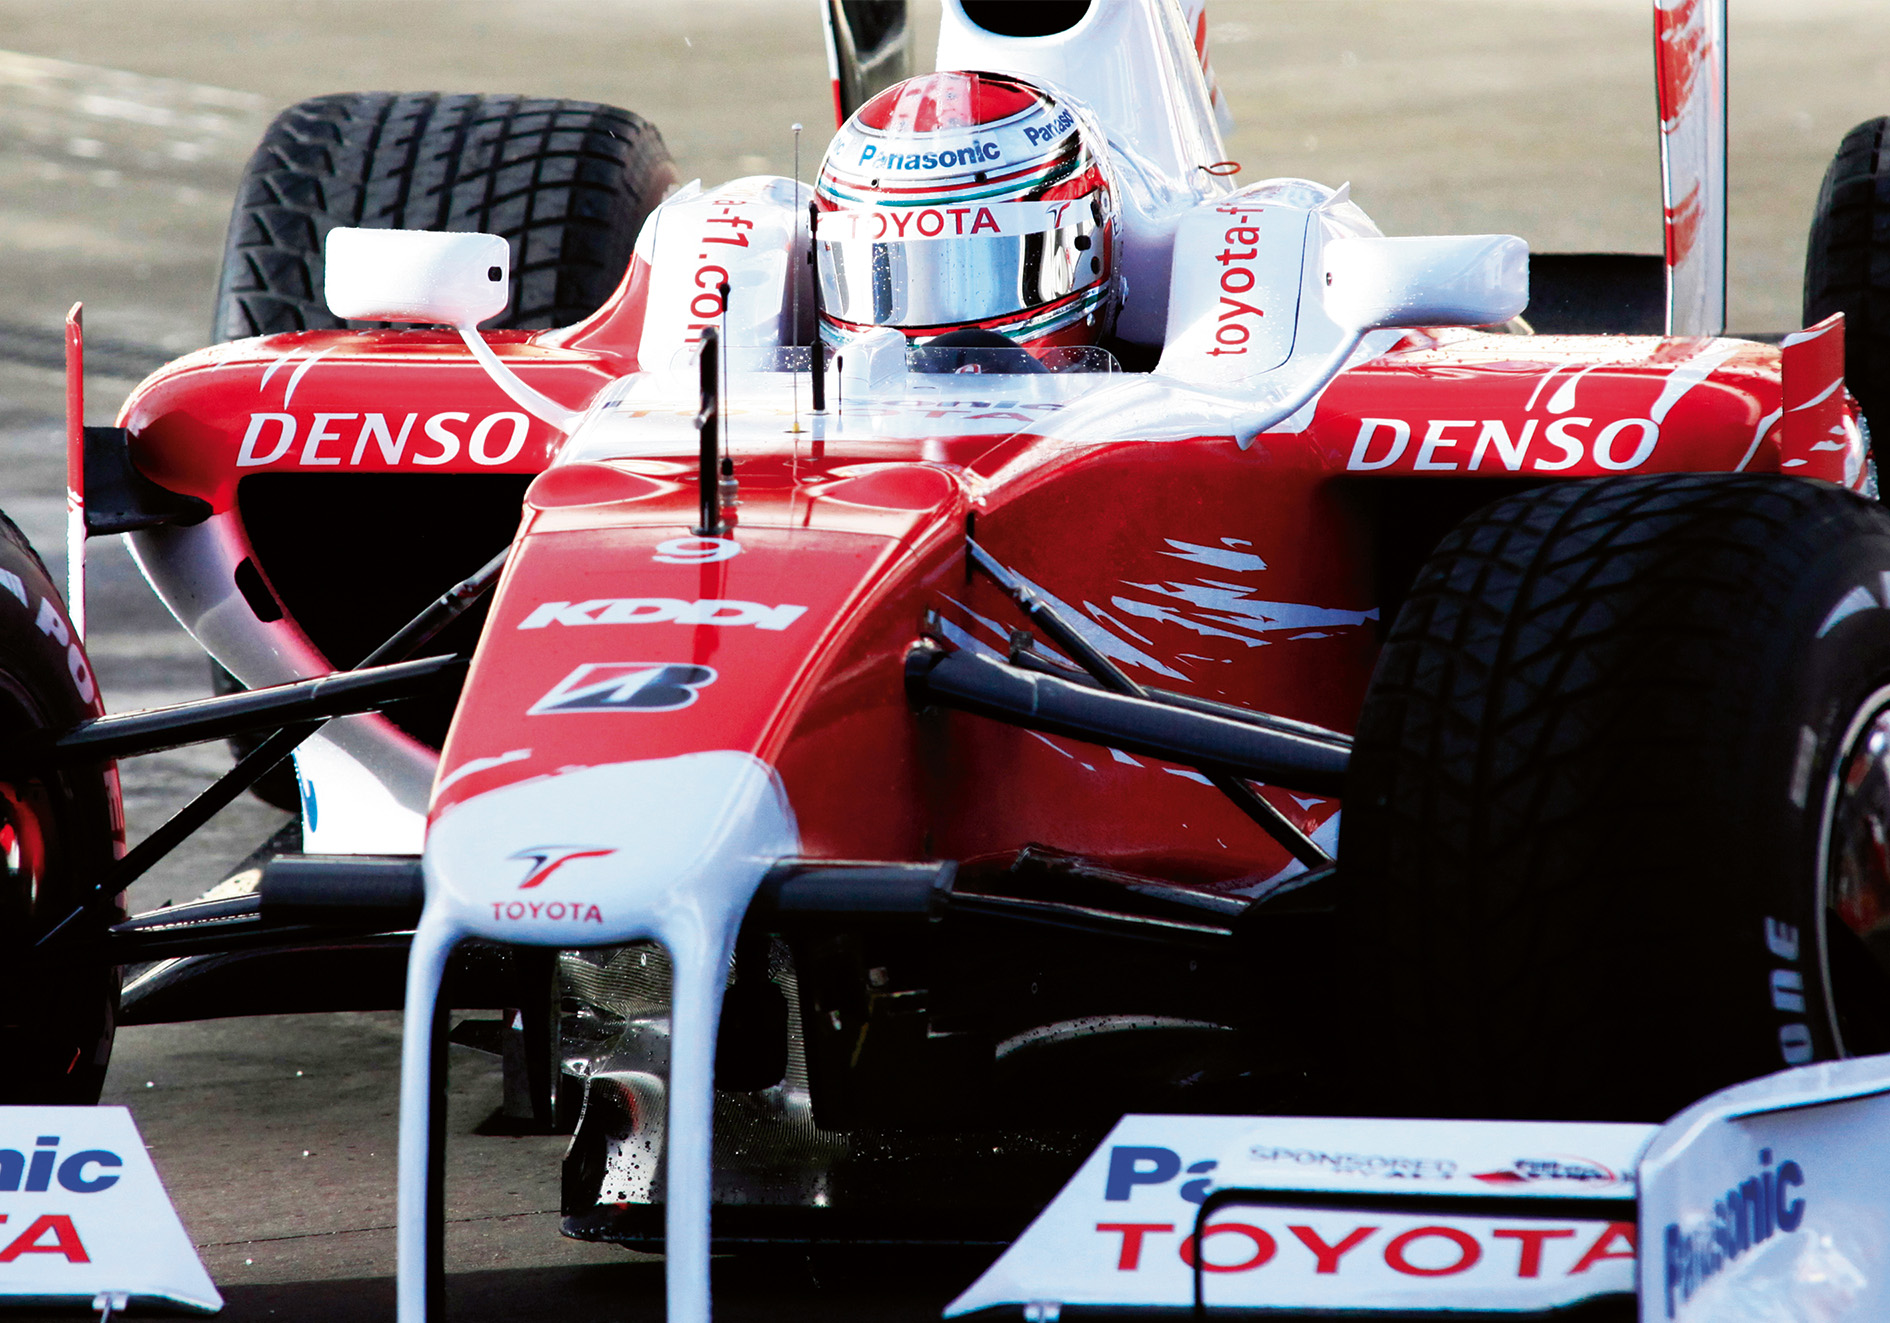 28_Josekdesign_Toyota_F1_Fotografie.jpg